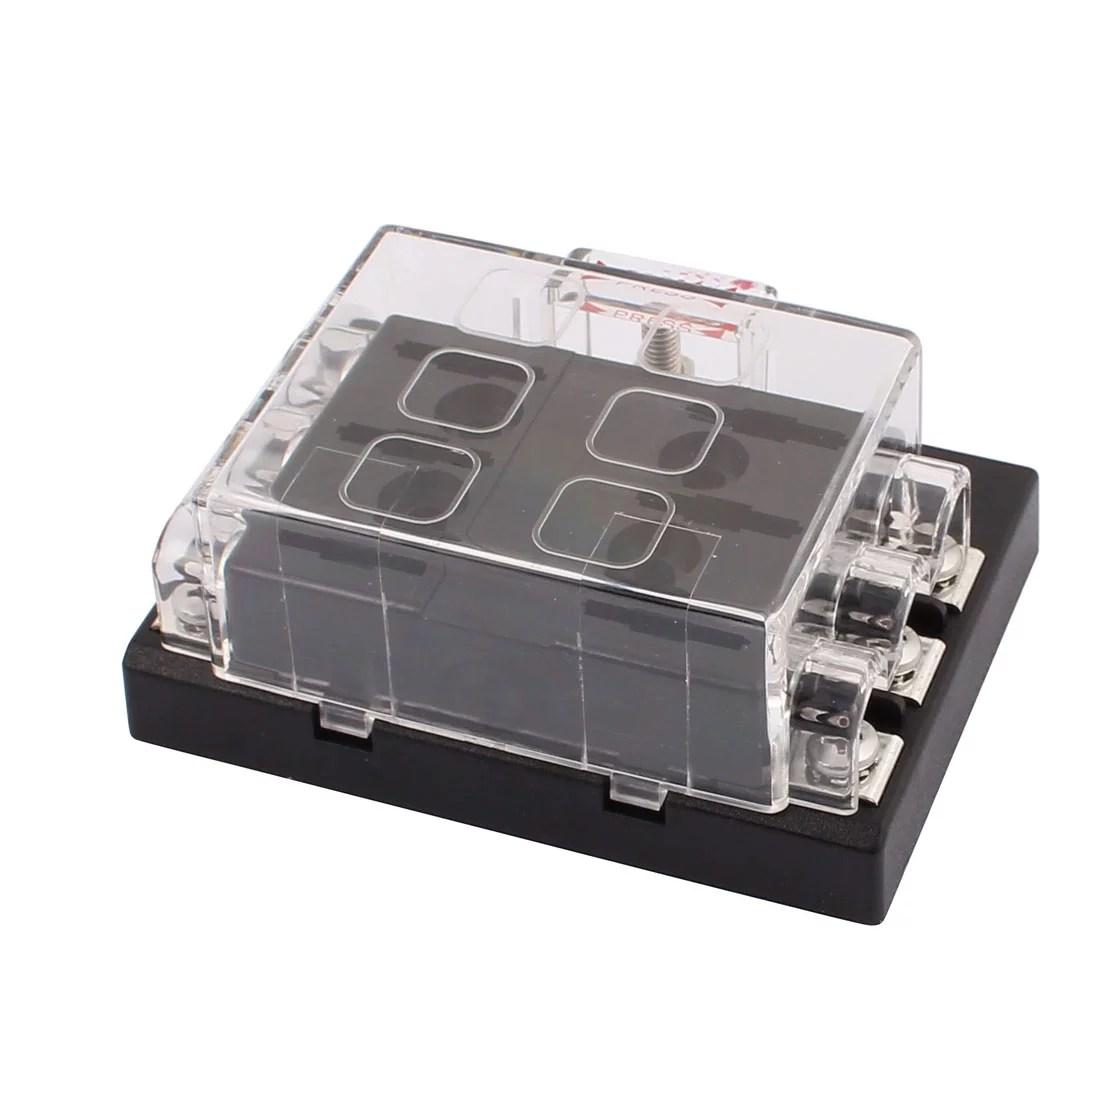 hight resolution of dc32v 6 way terminals circuit car auto fuse box block holder w fuse walmart com